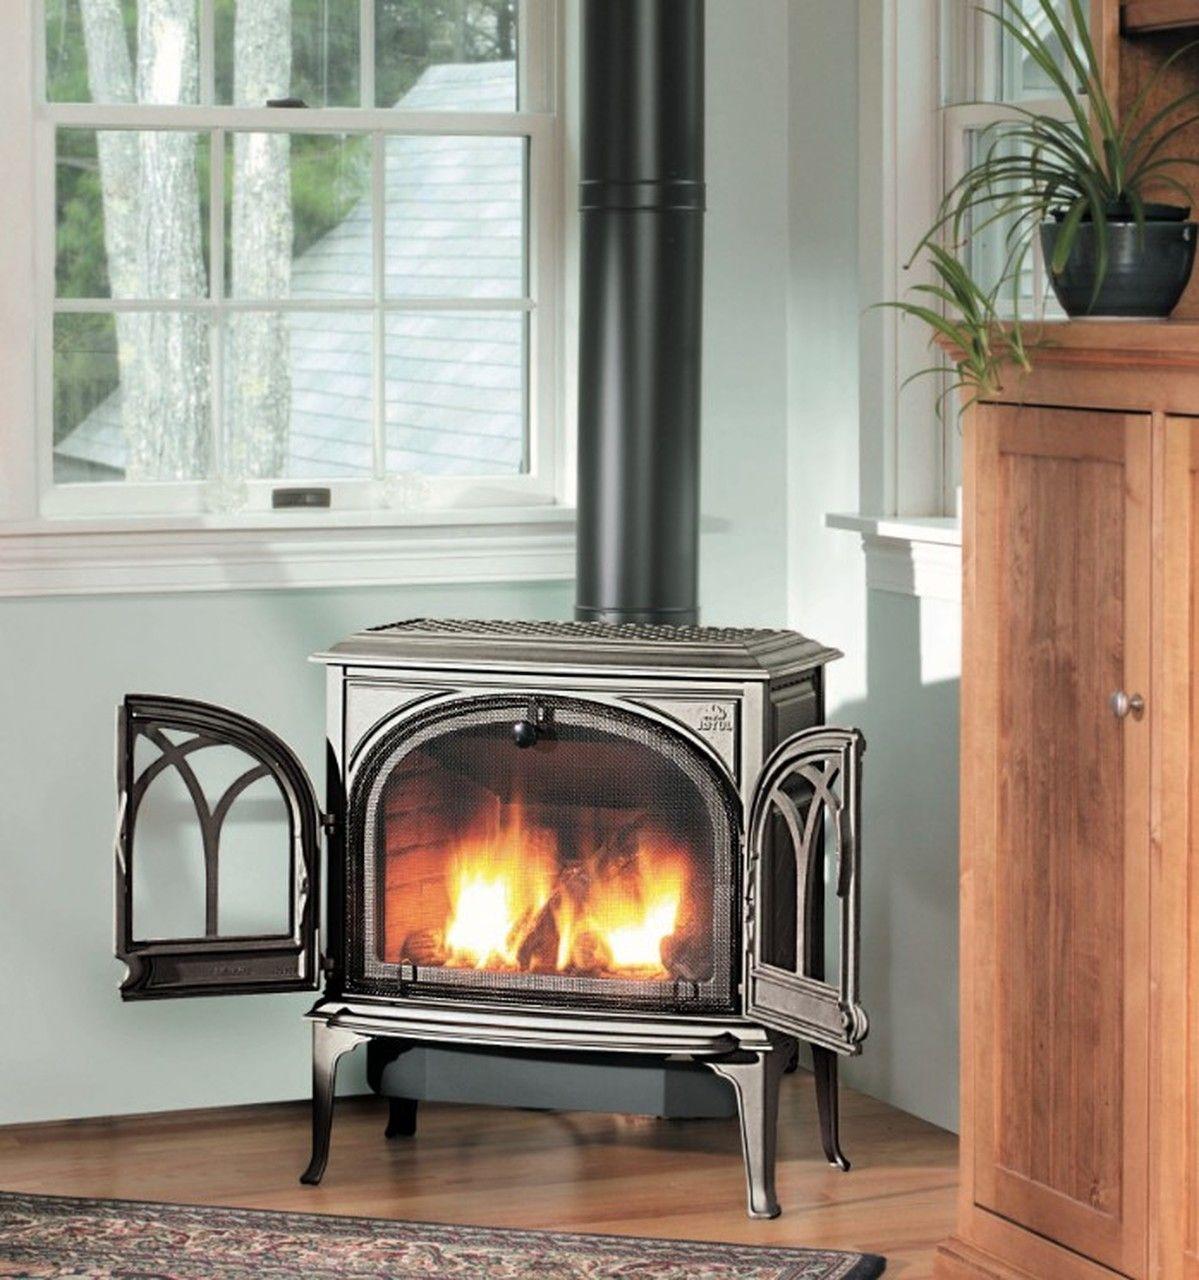 Jotul Gf400 Dv Gas Stove Gas Stove Wood Stove Freestanding Fireplace